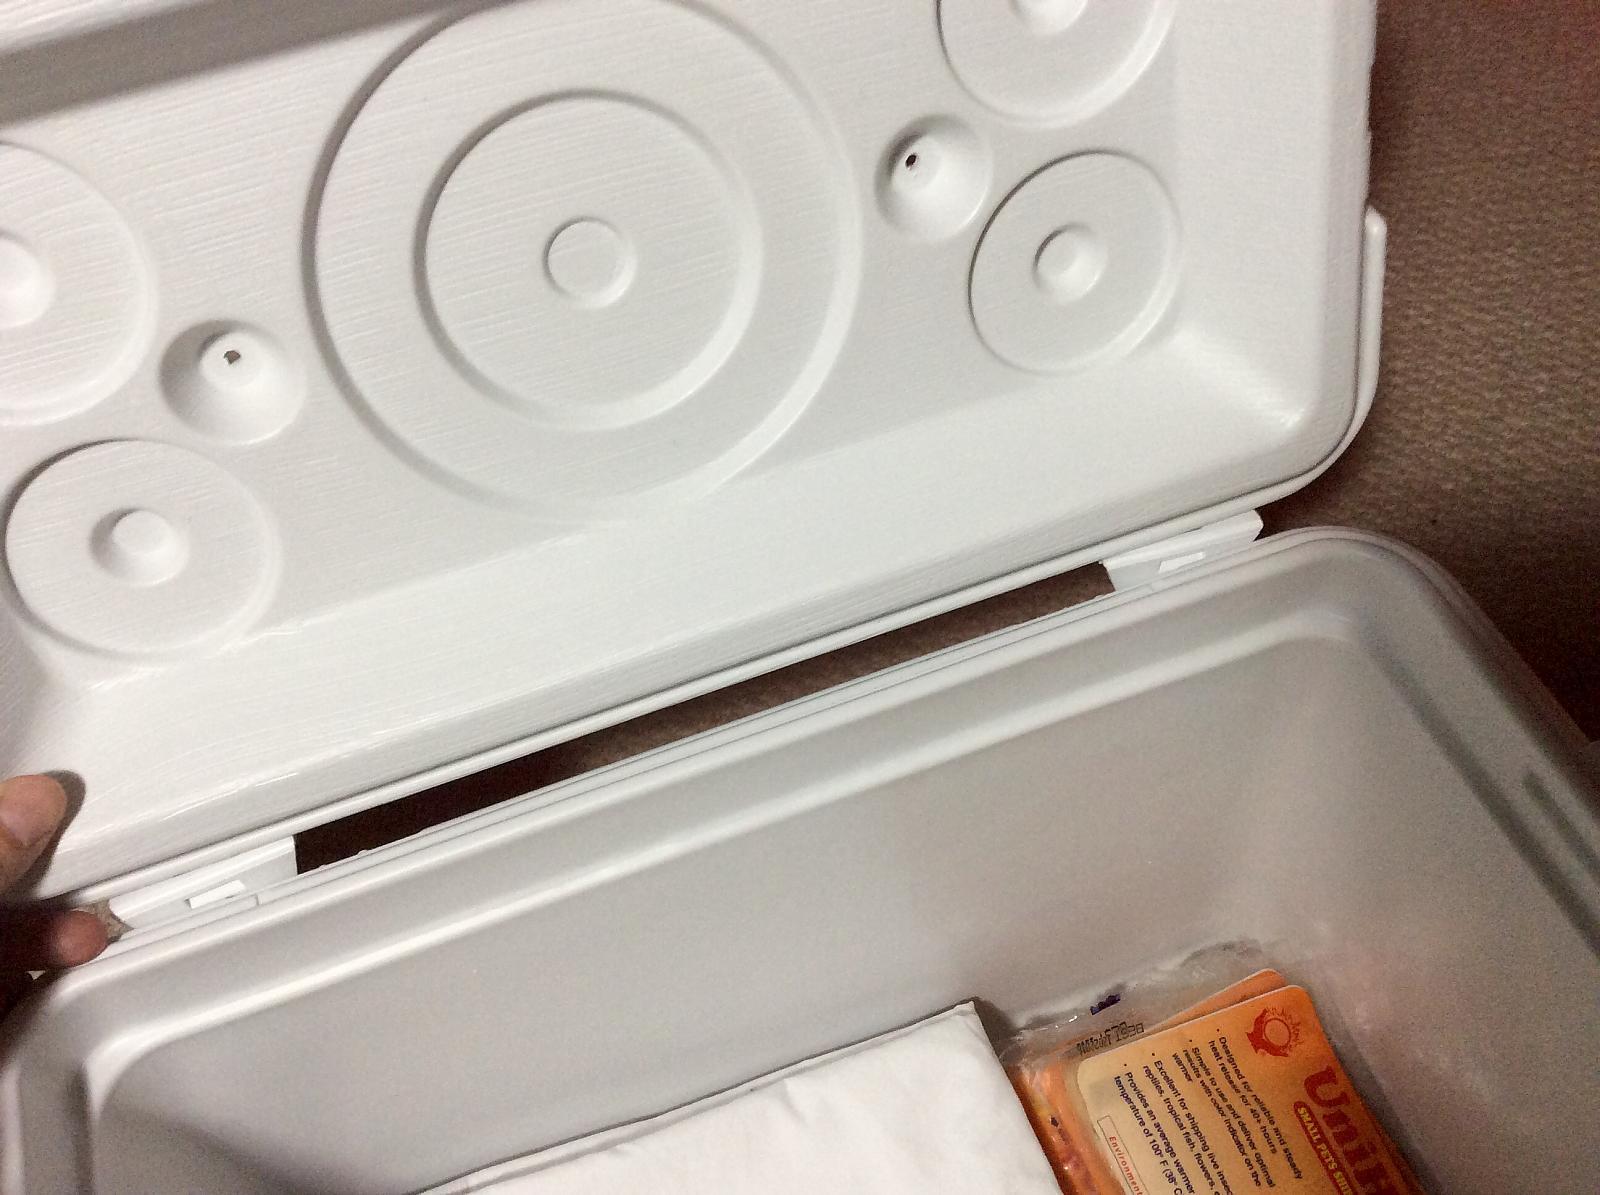 Cooler emergency supplies